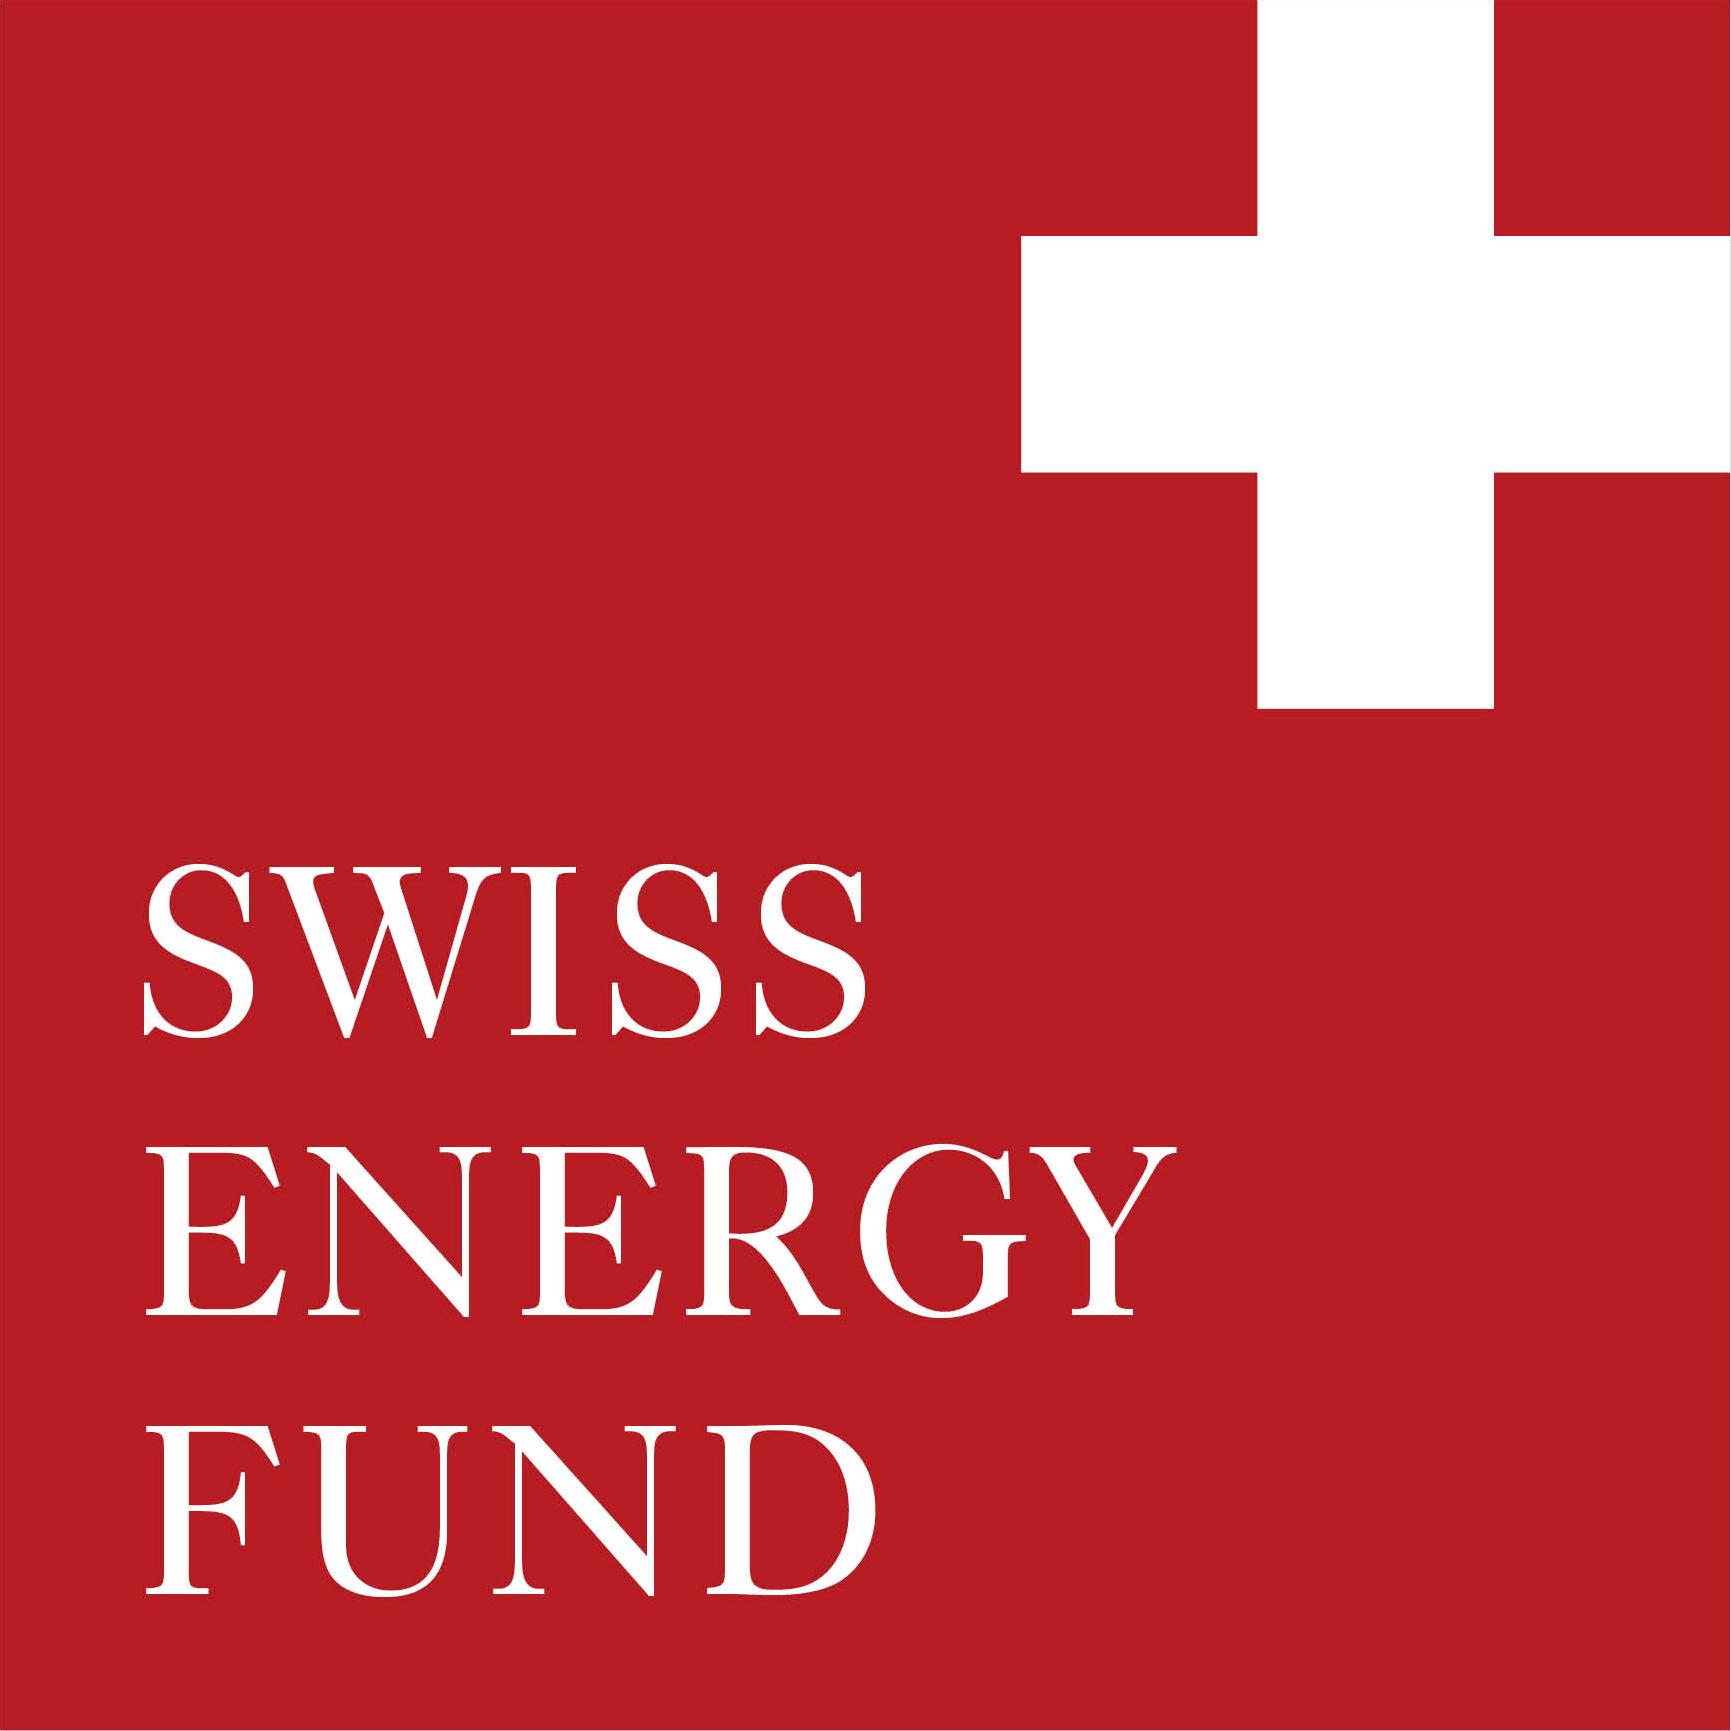 Swiss Energy Fund